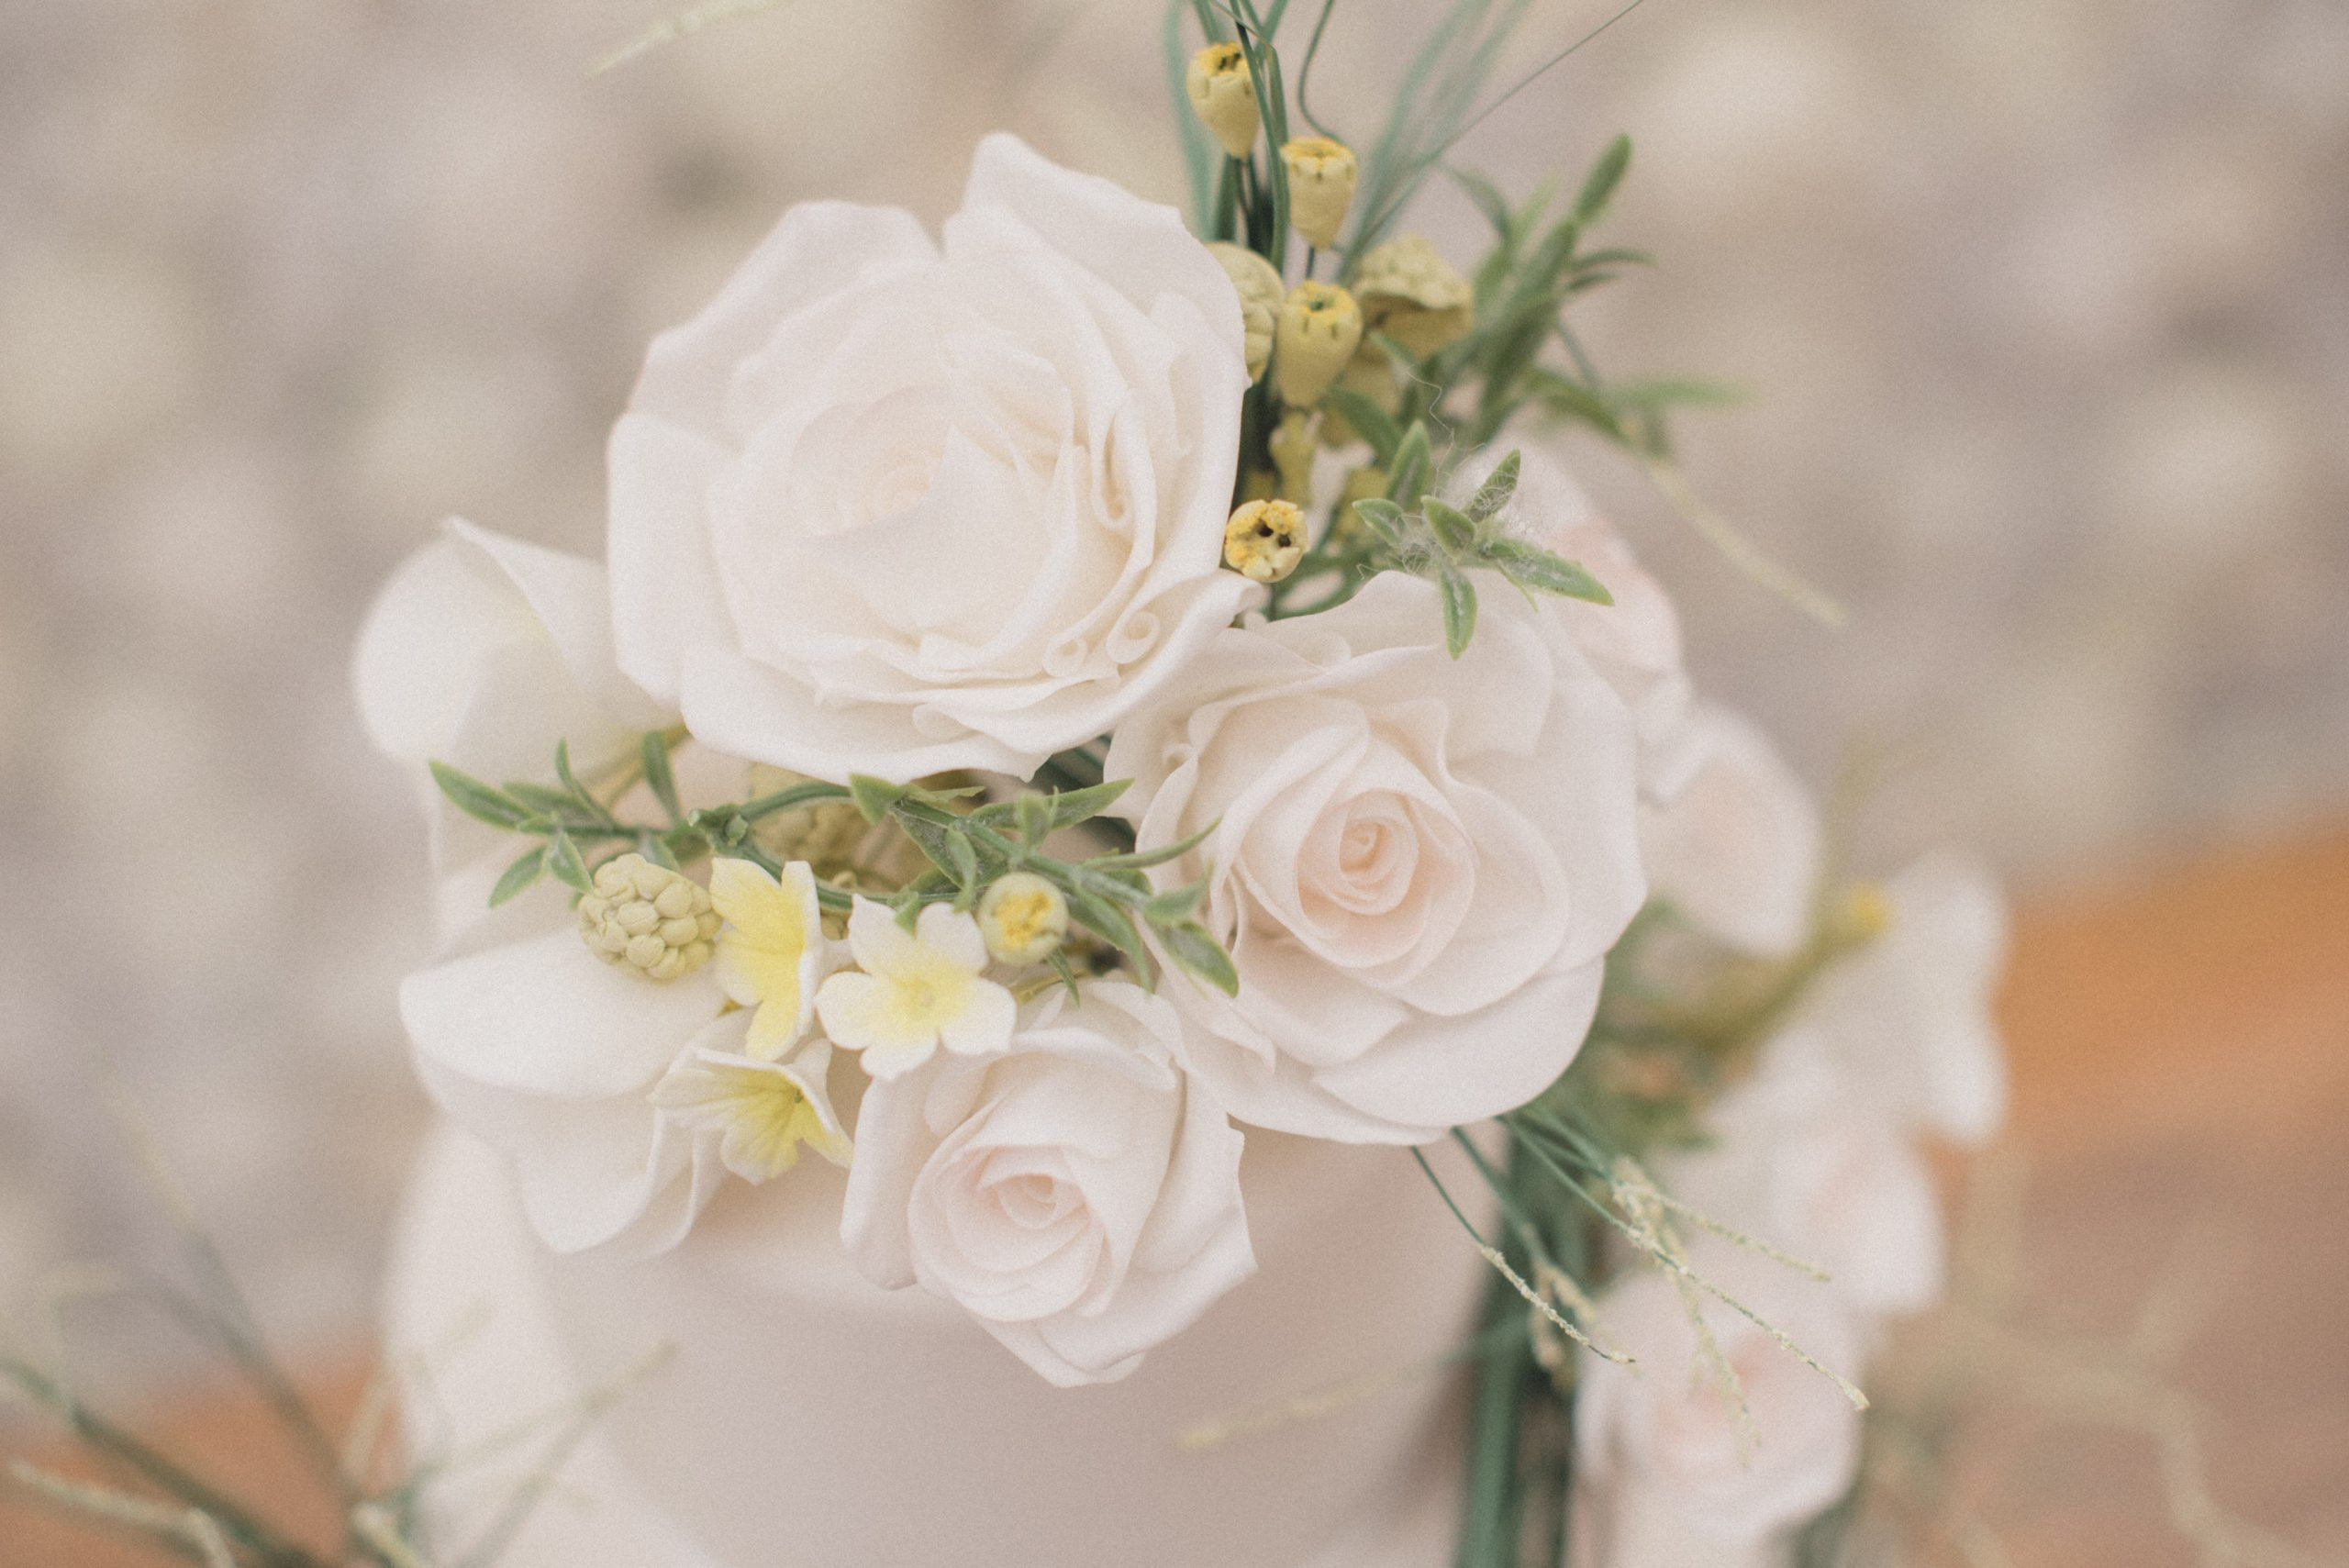 Sugar Flowers Bluebell Kitchen Wedding Cakes Kent White Roses